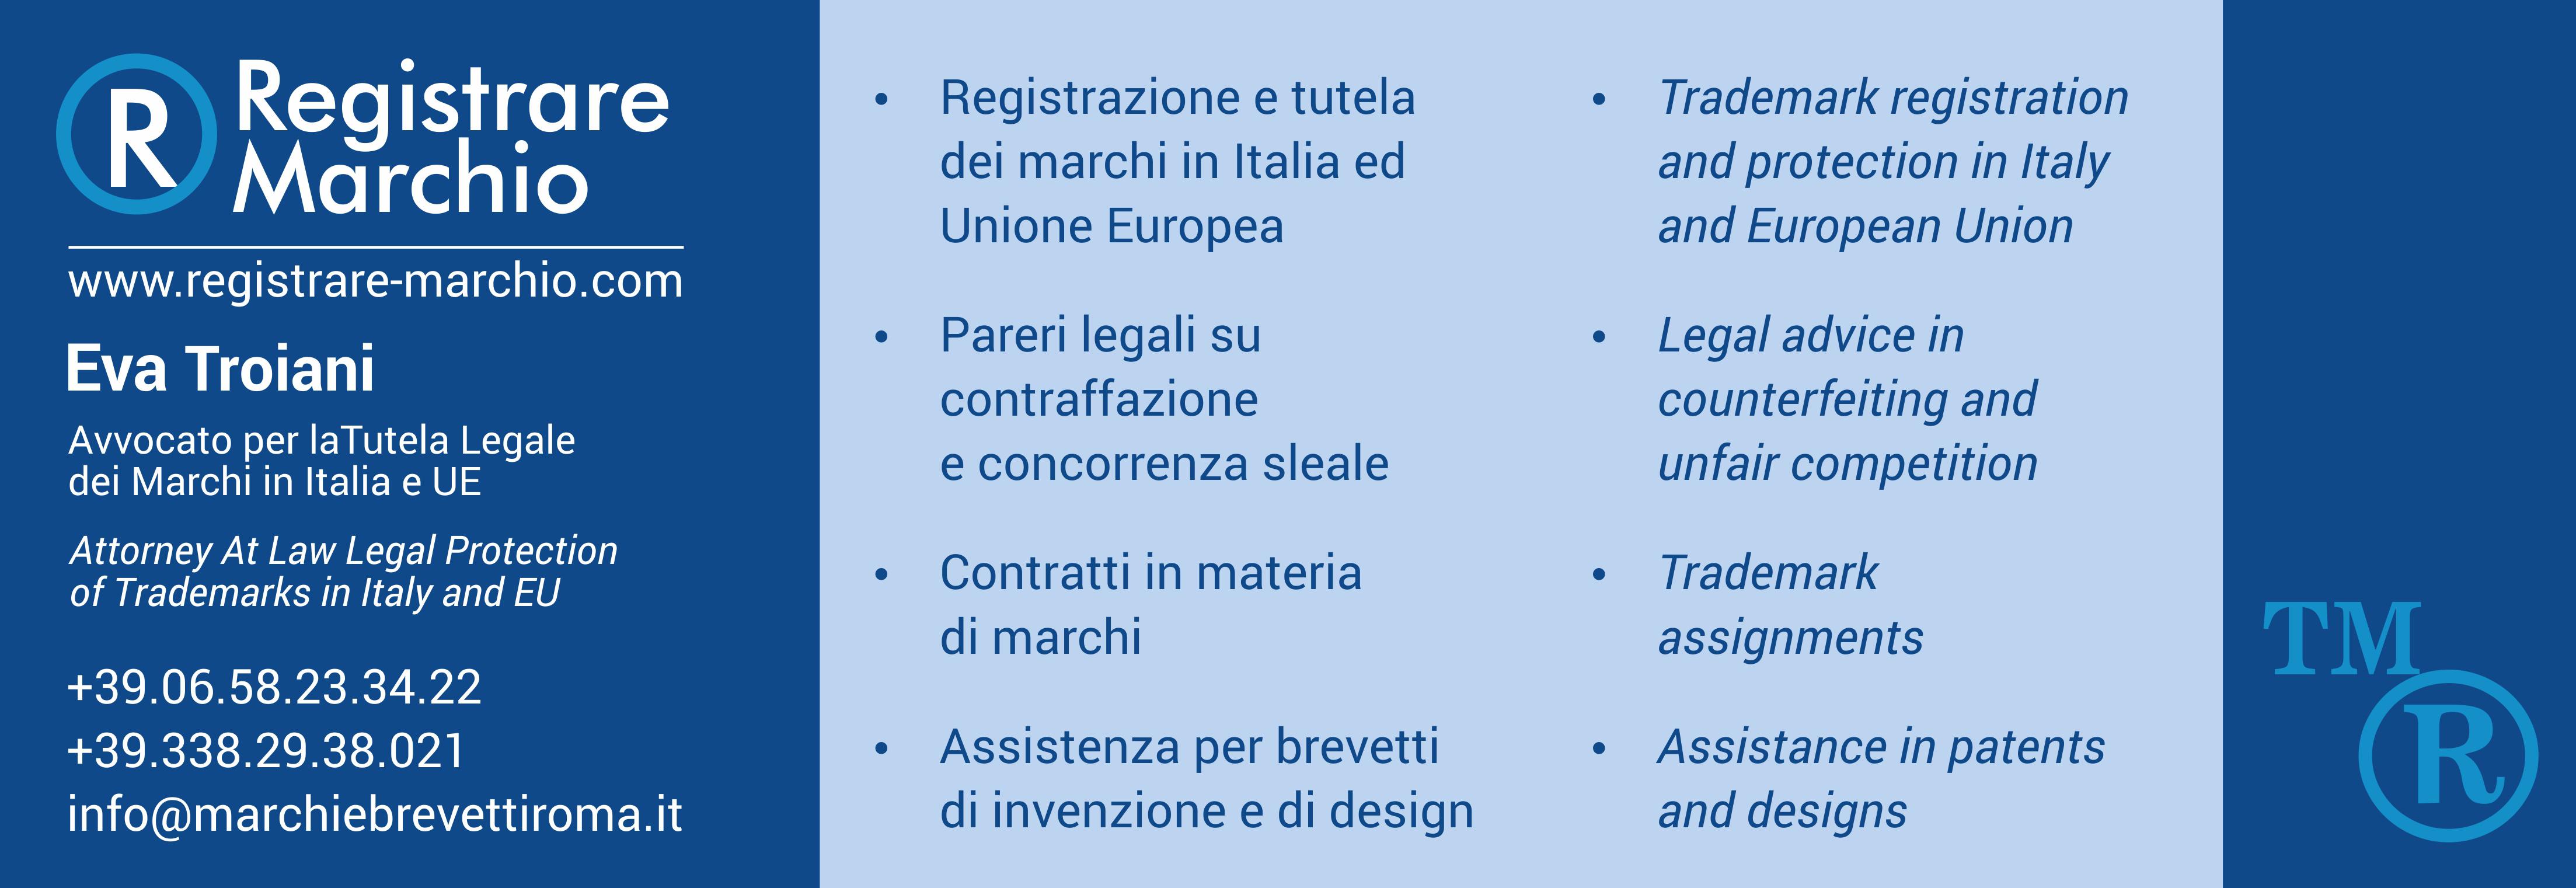 Registrare Marchio